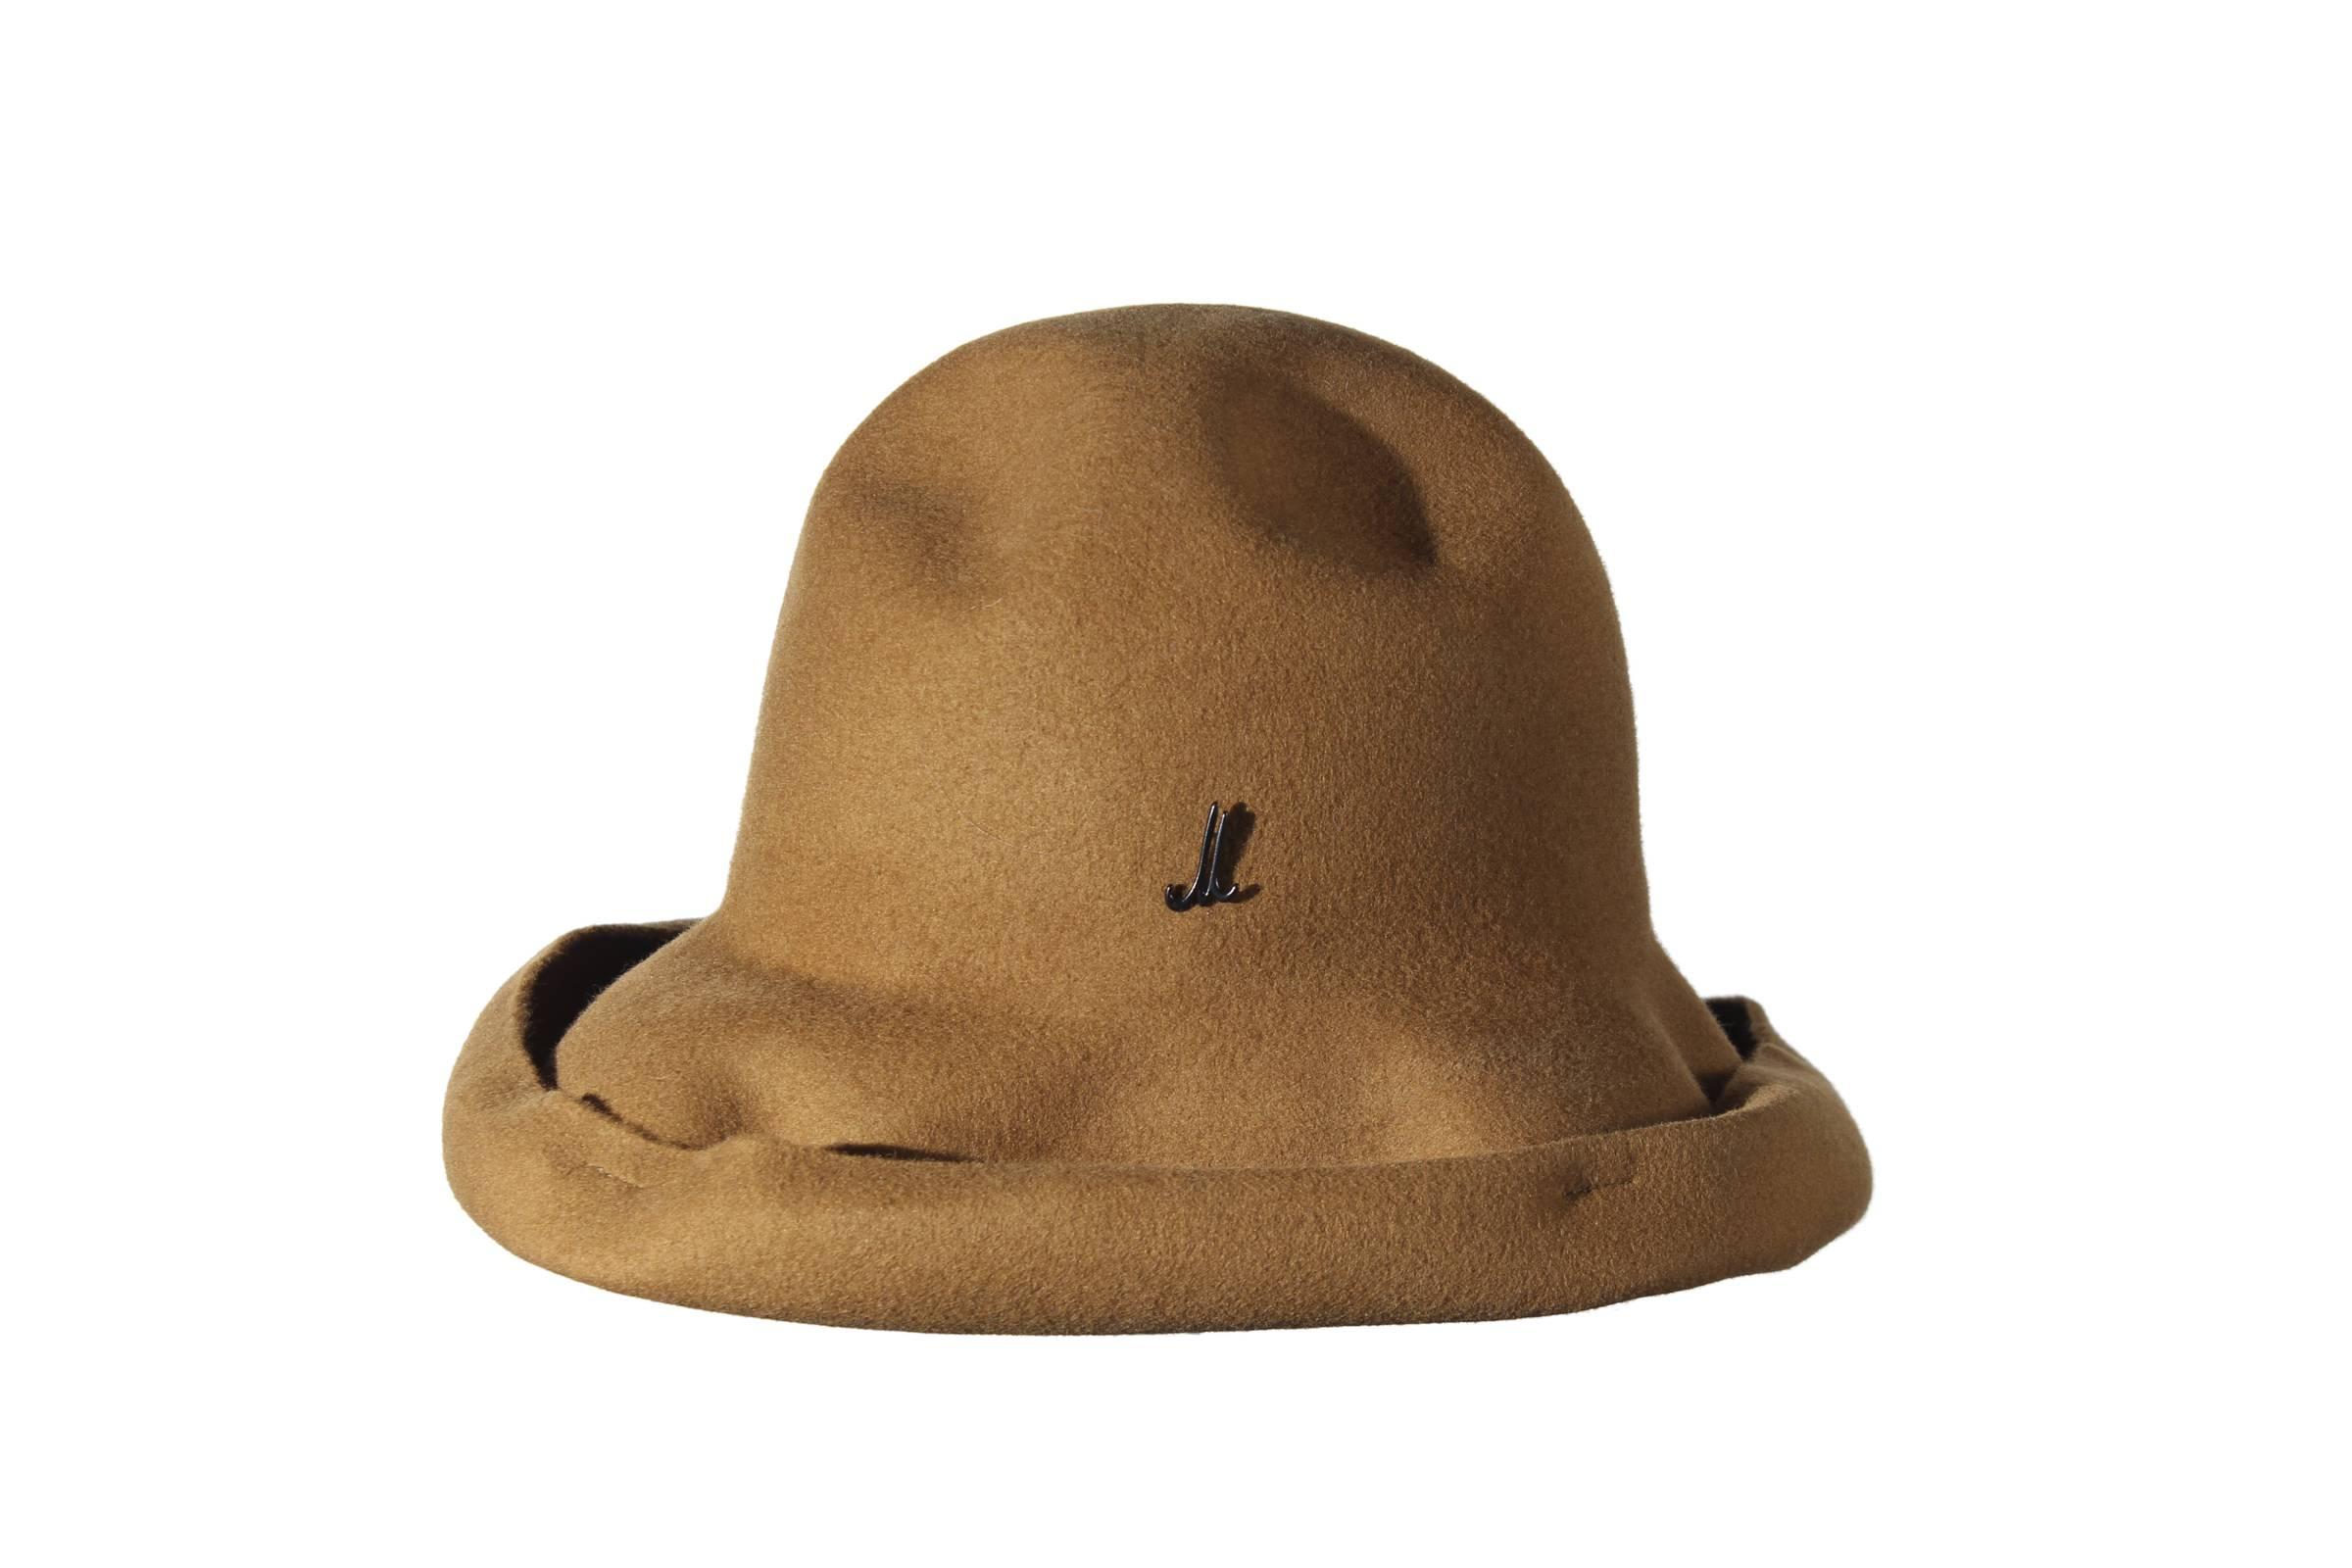 foldable hat RESI RAMA wool felt light